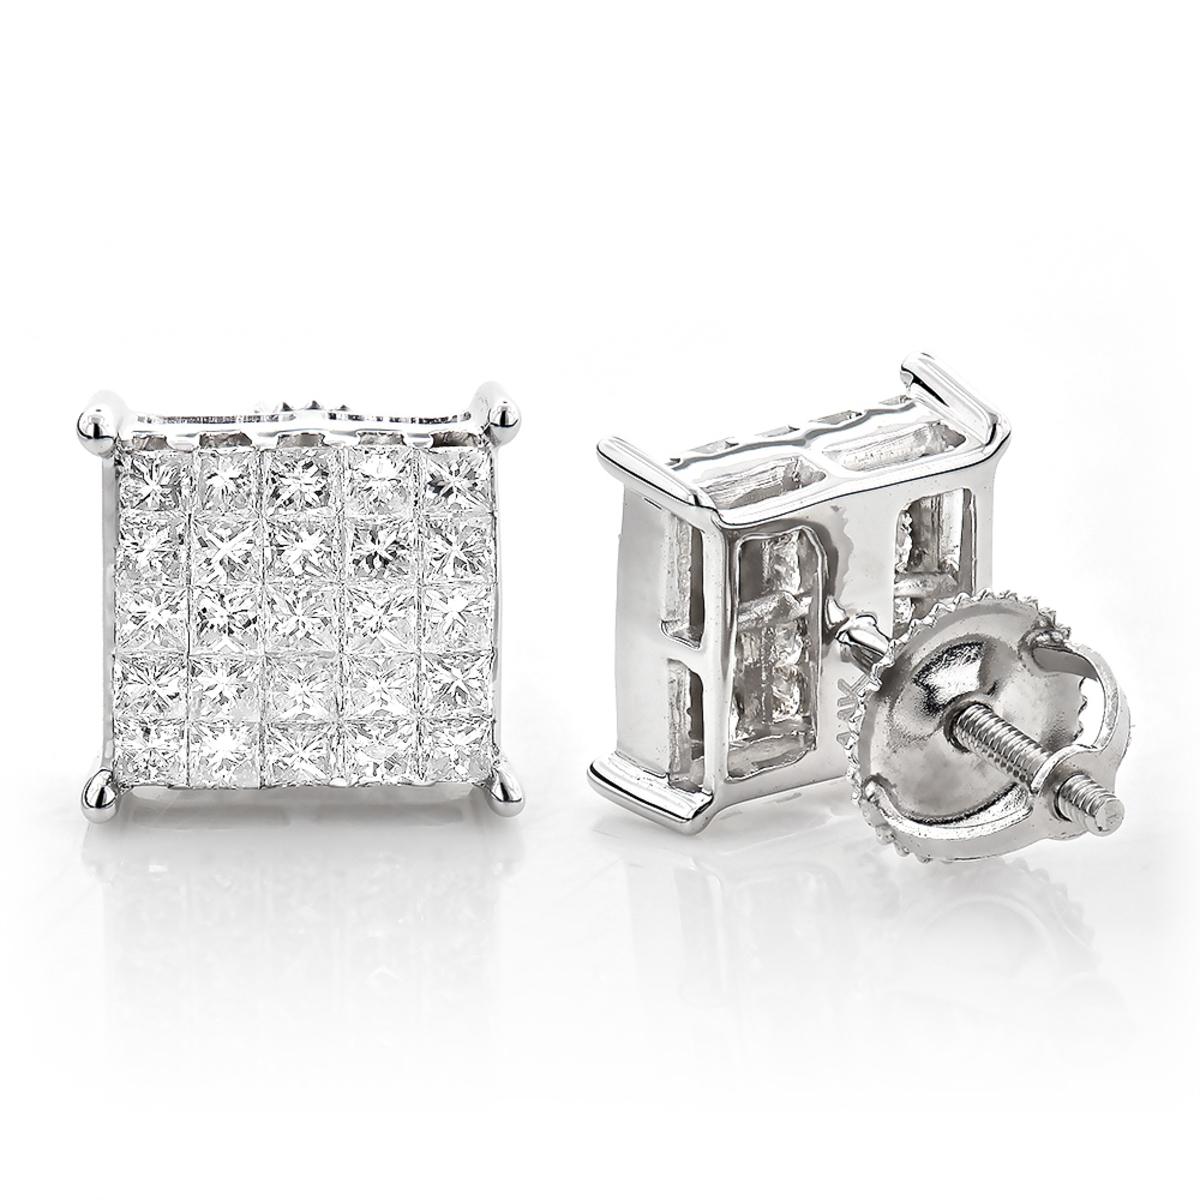 Princess Cut Diamond Earrings - Invisible Setting 1.15